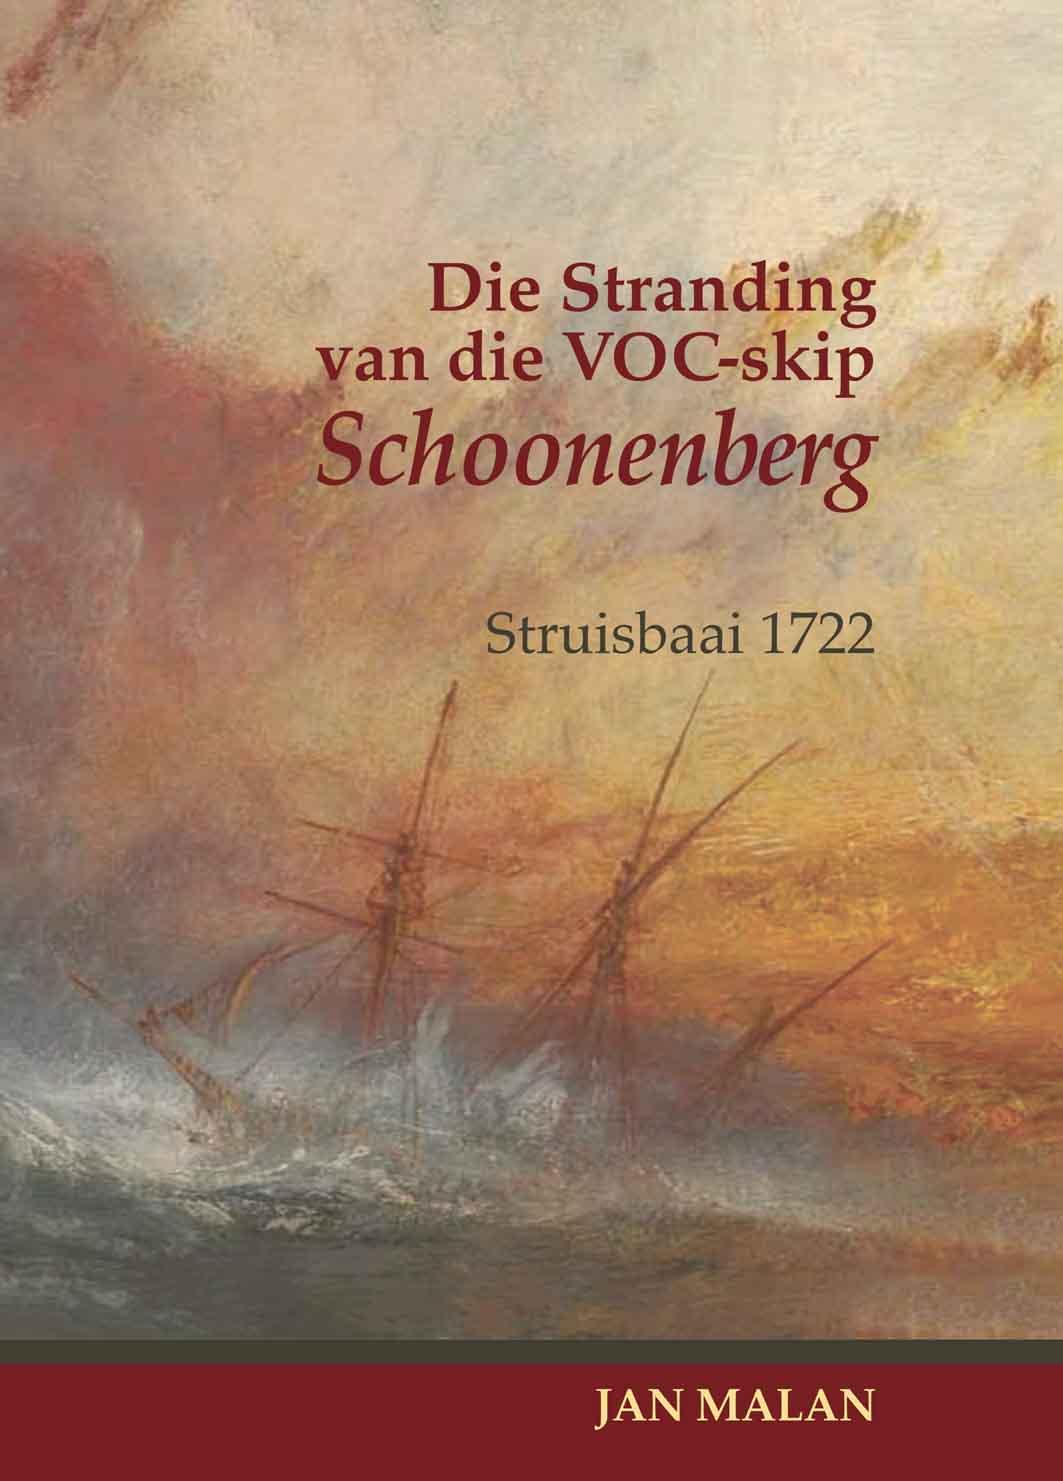 Book cover for Die Stranding van die VOC-skip Schoonenberg: Struisbaai 1722 by Jan Malan published by Africana Publishers